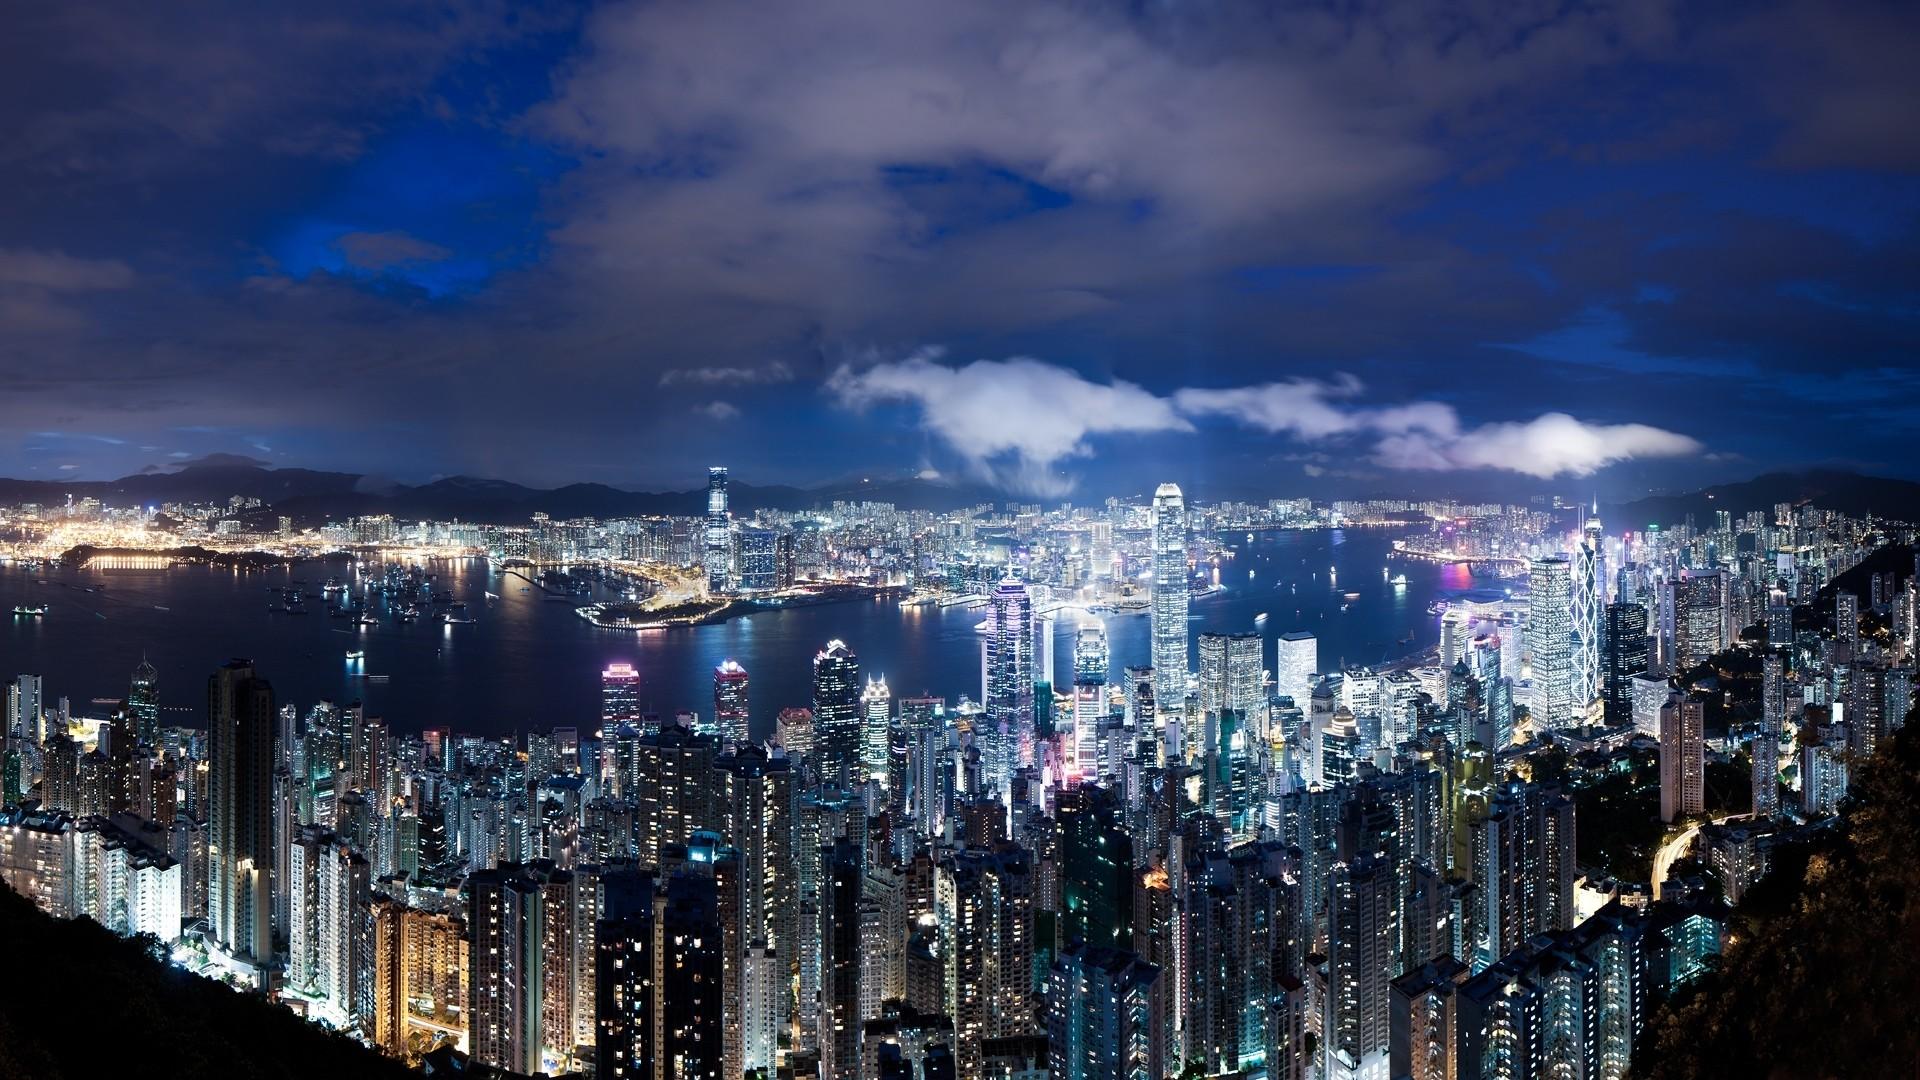 Wallpaper hong kong, china, night, metropolis, skyscrapers,  lights, blue